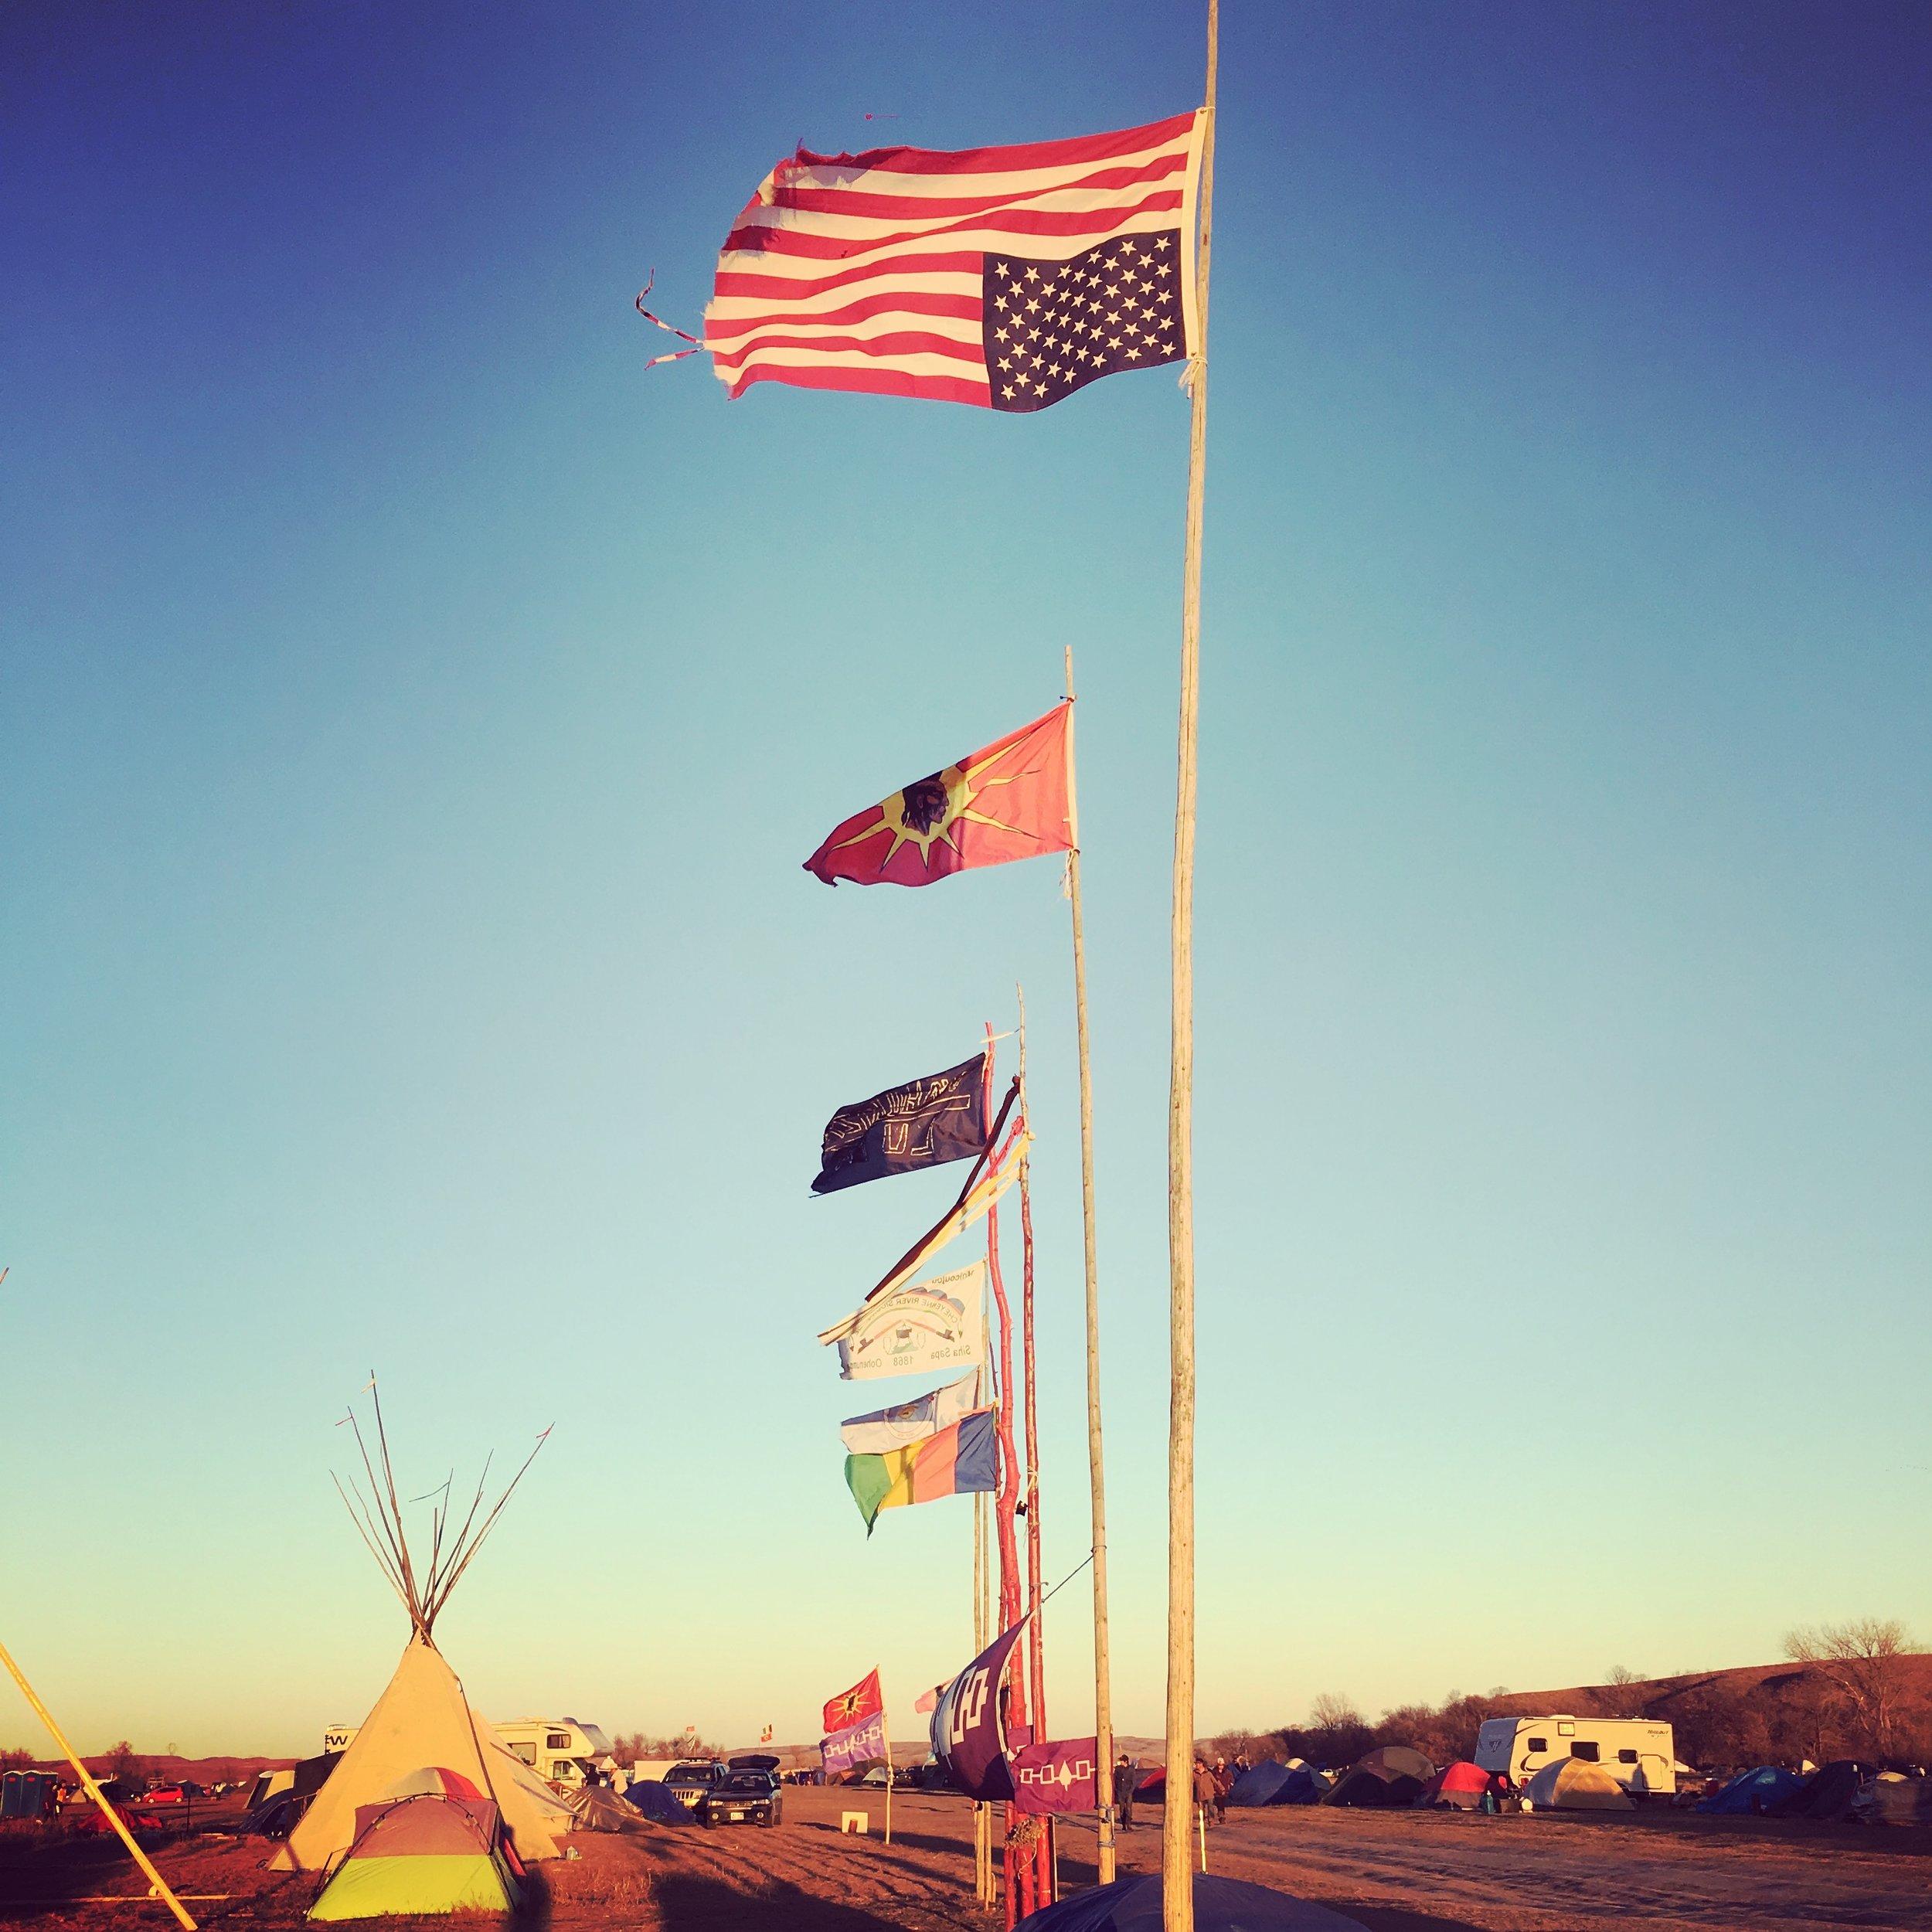 Photo taken by  Matt Halvorson  on the Standing Rock Reservation in November 2016.